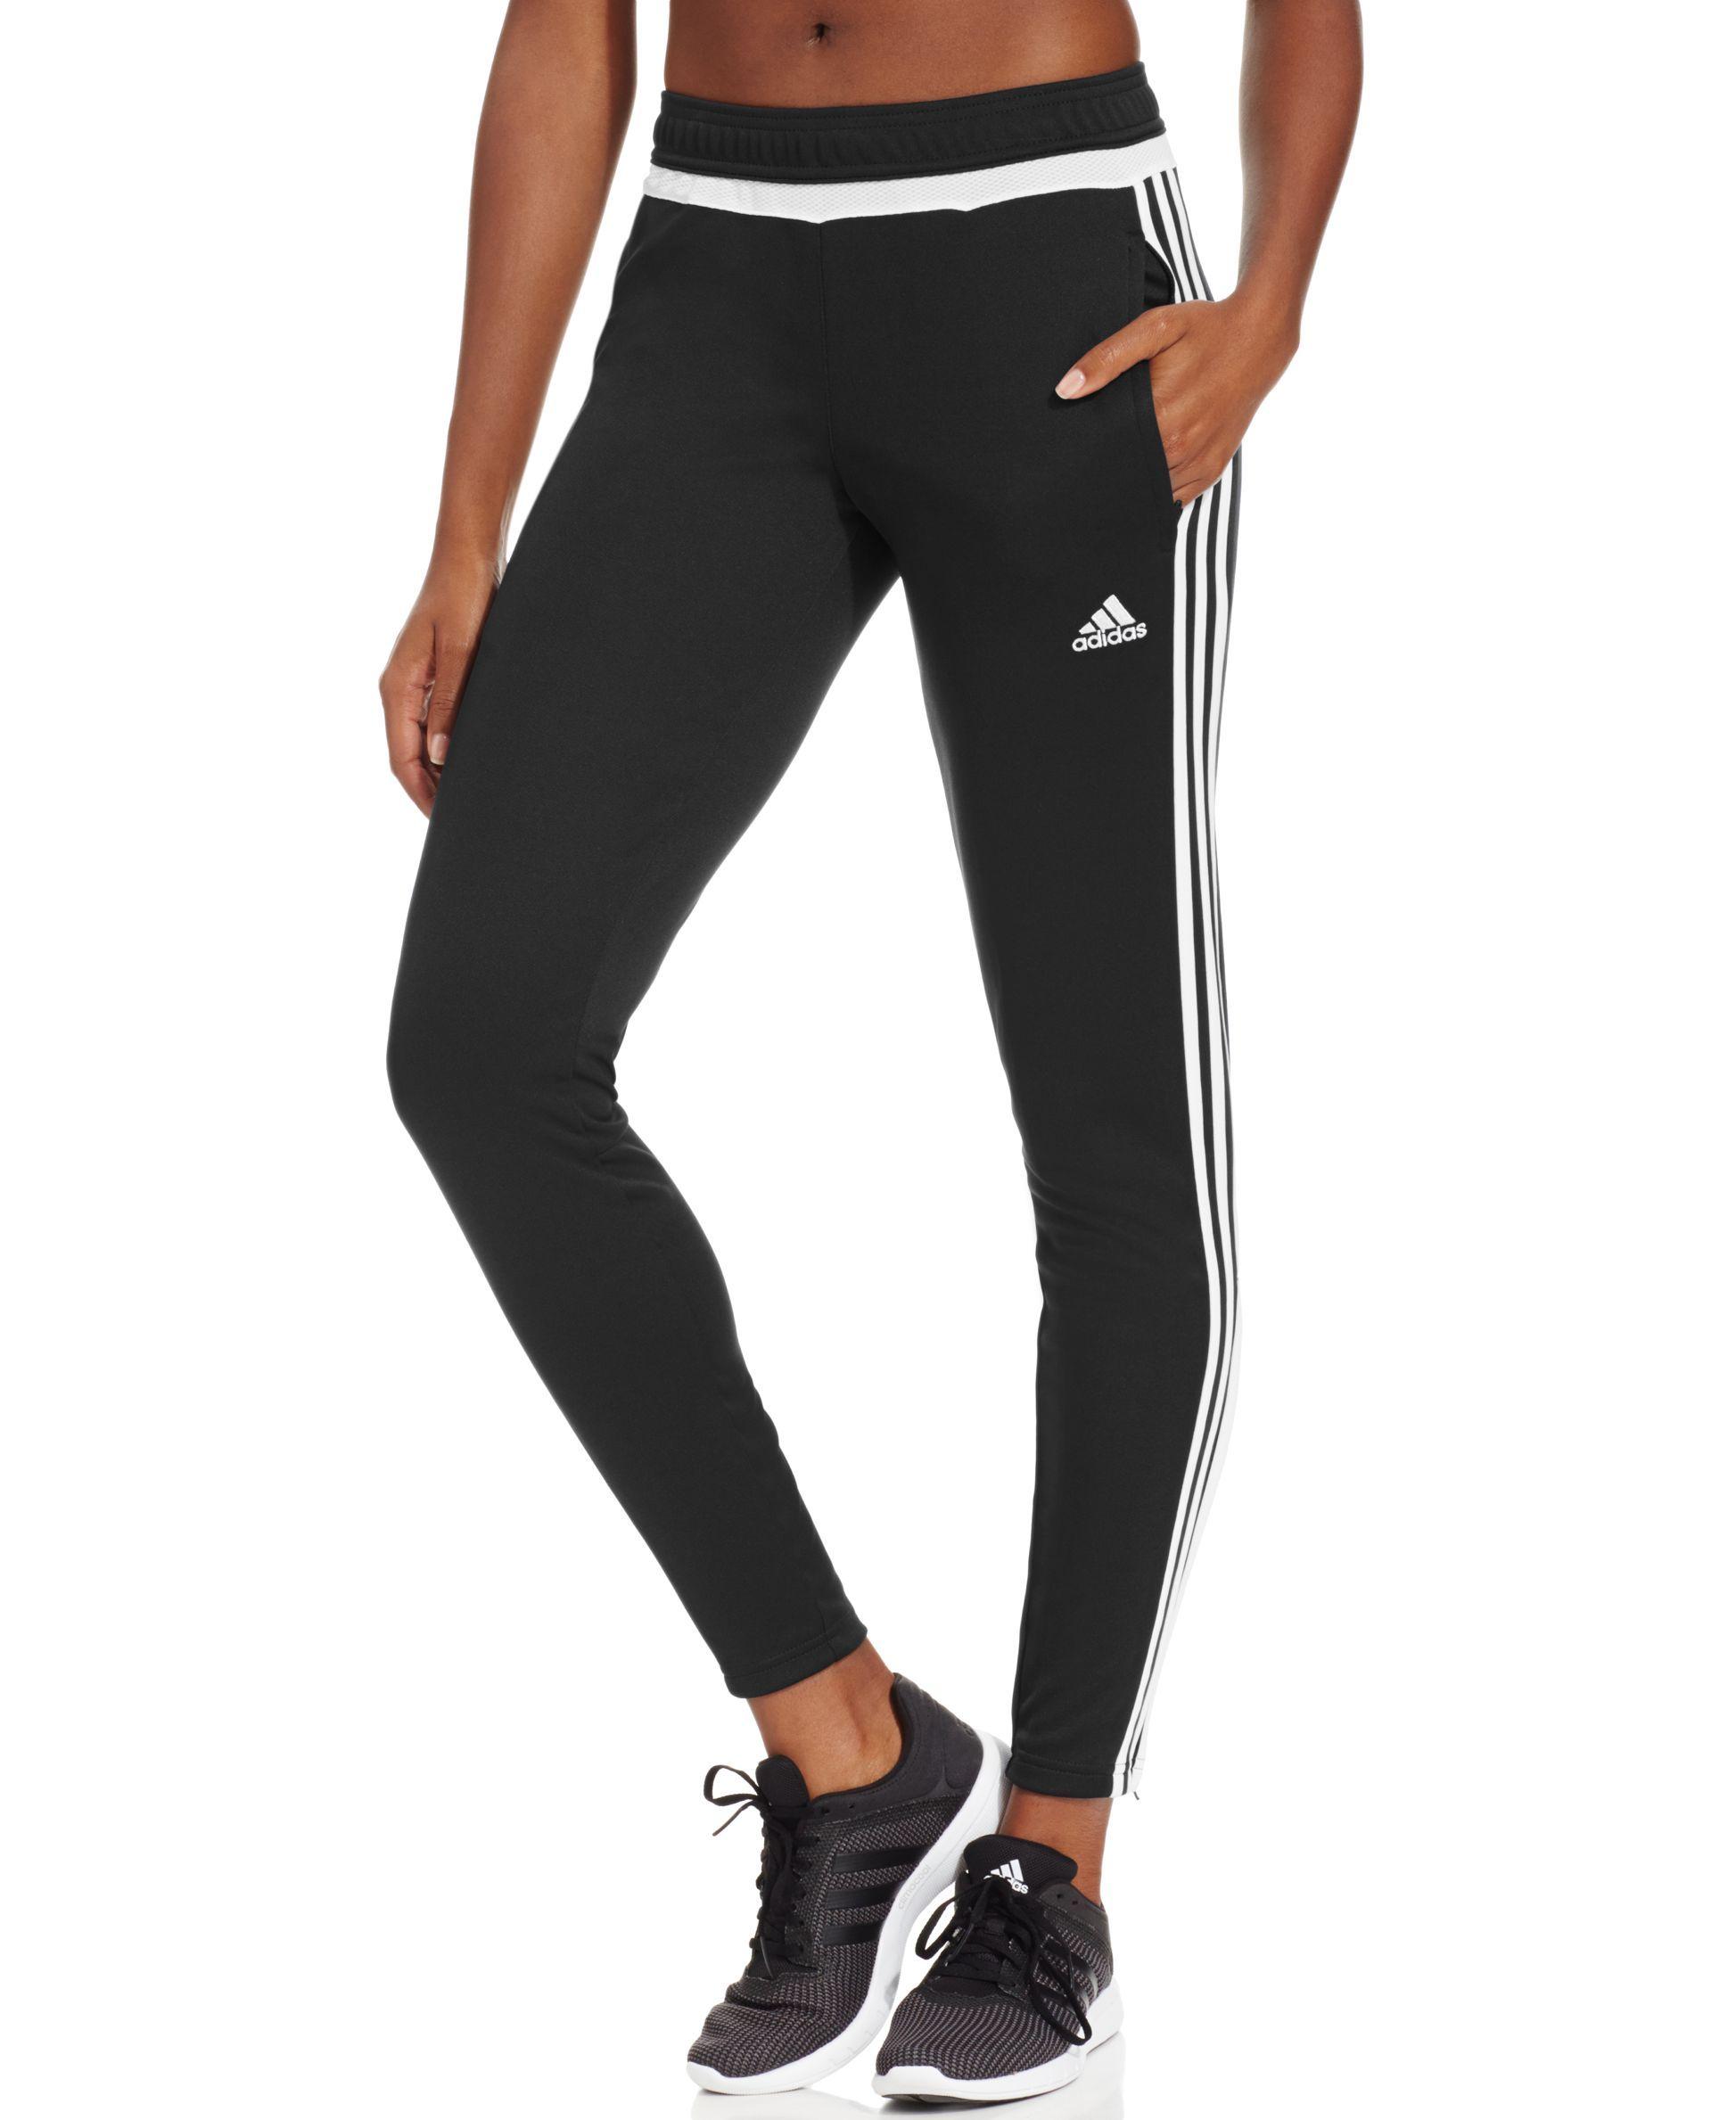 Adidas Tiro 15 ClimaCool Training Pants | Active wear for